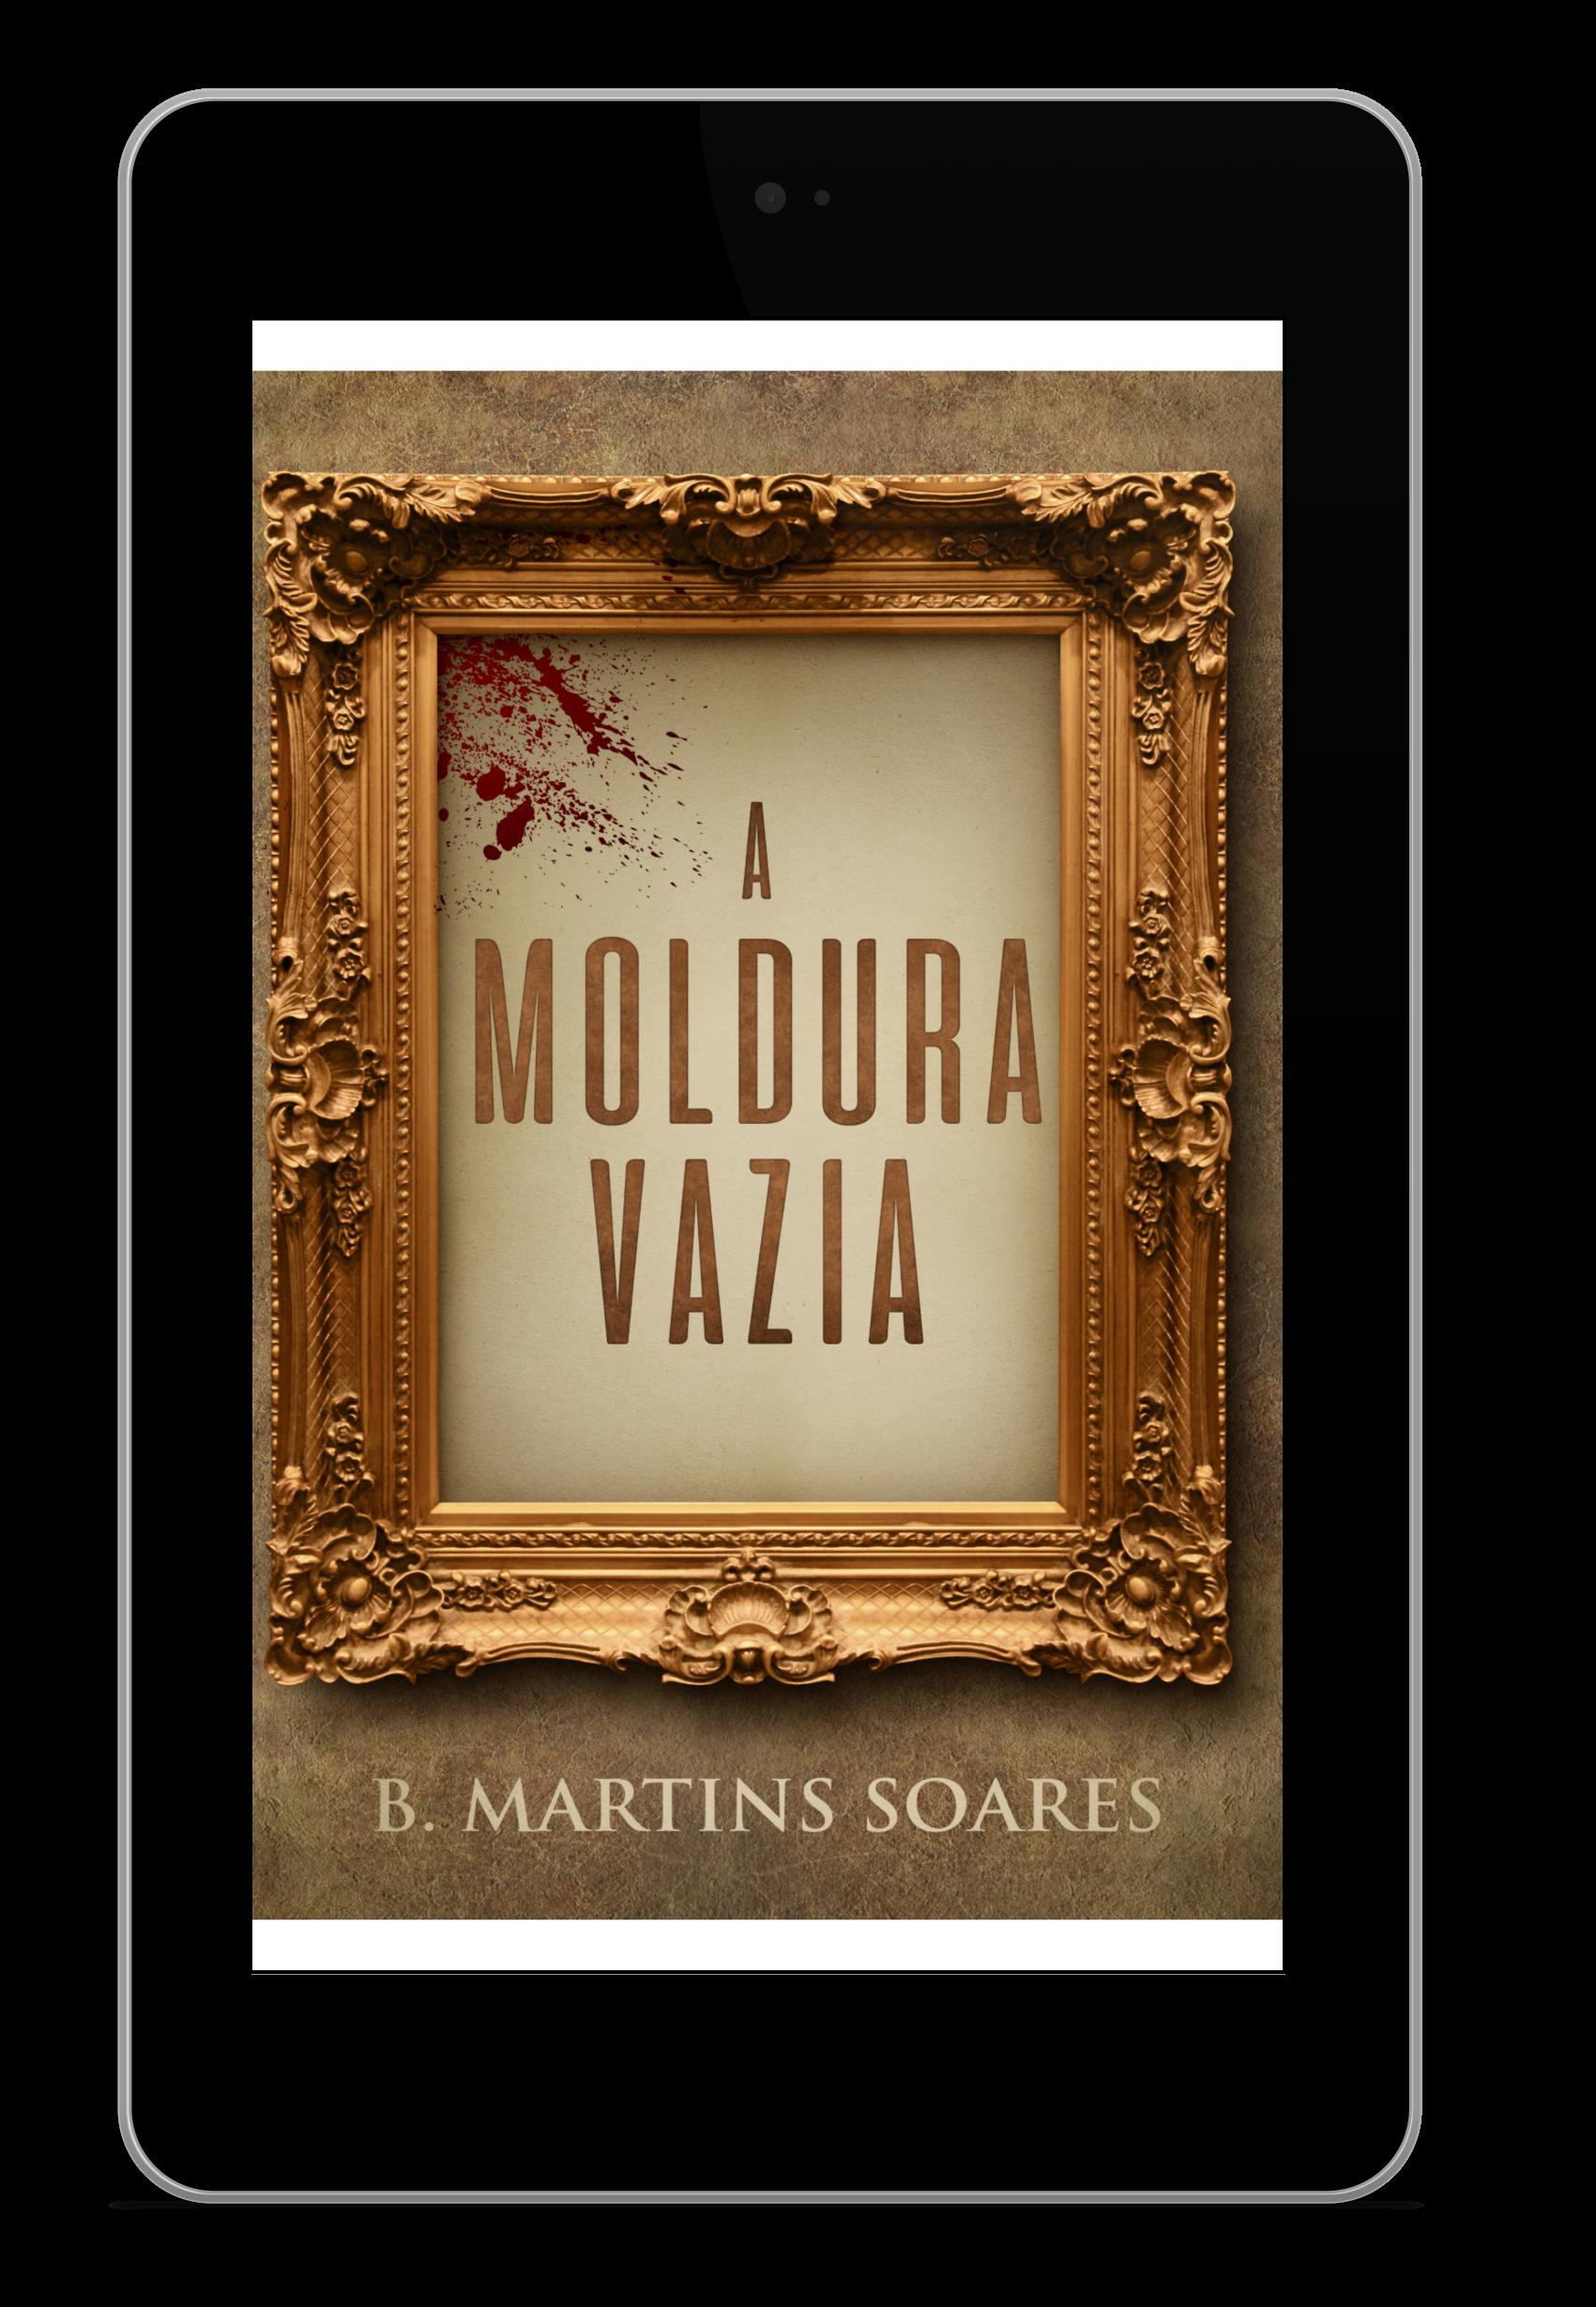 Moldura_google-nexus-7-white-background_Crop